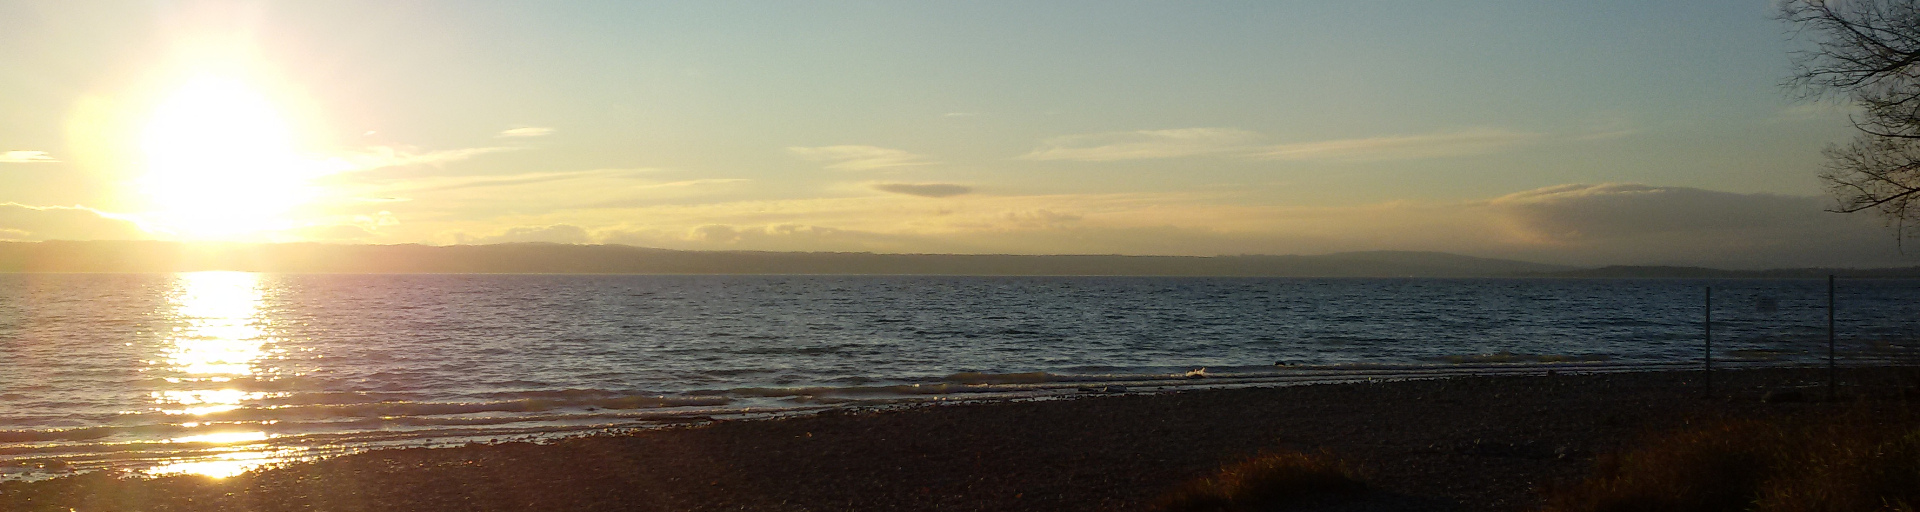 Strand in Immenstaad bei Sonnenuntergang